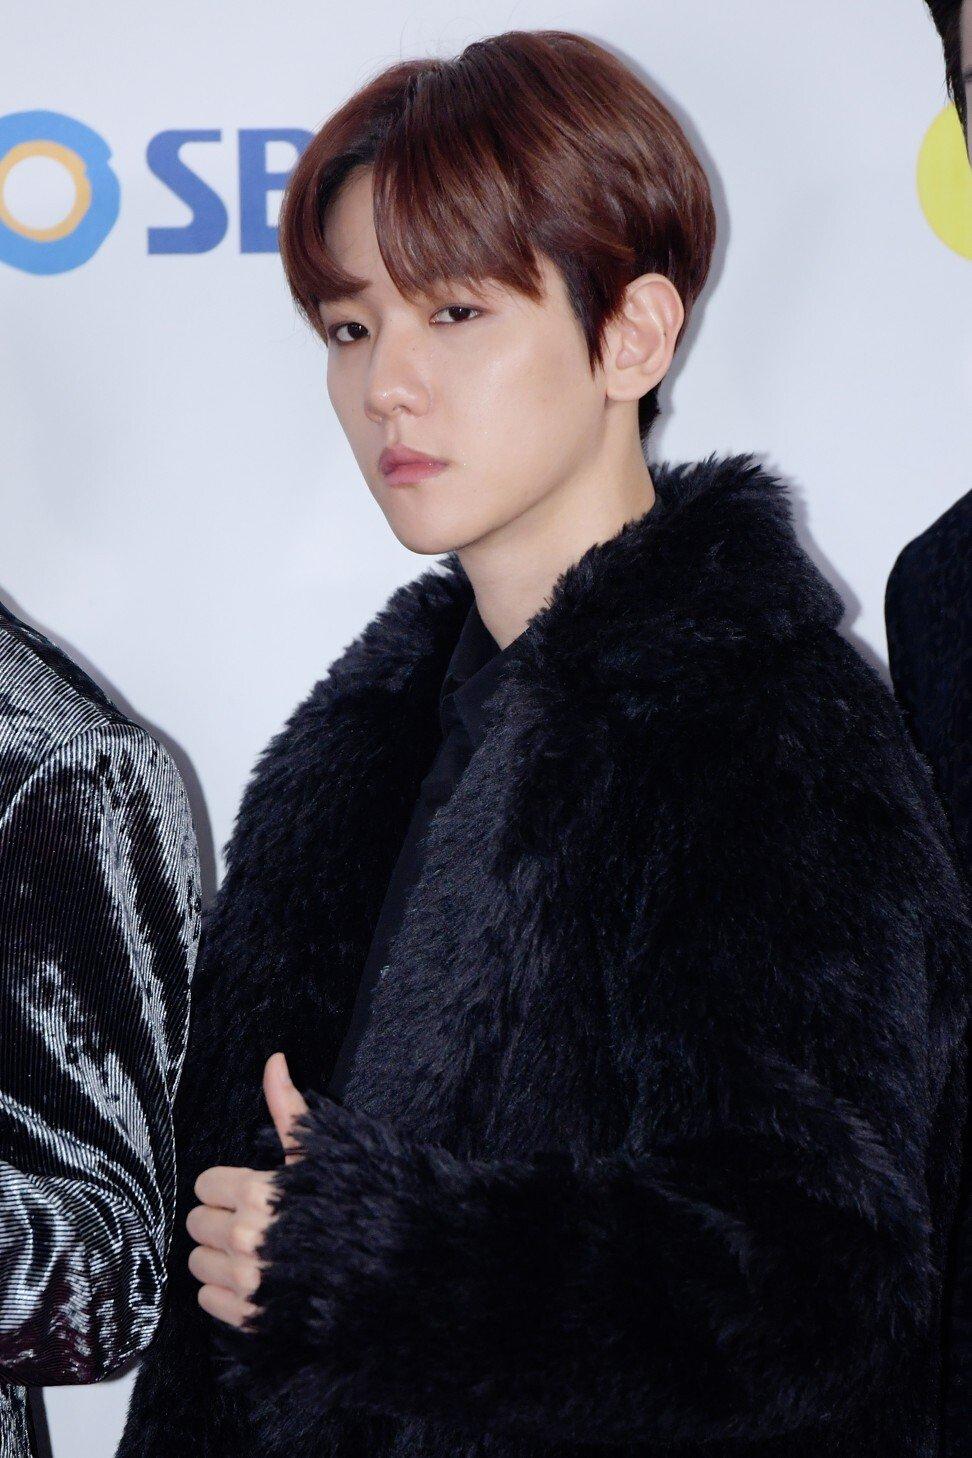 NCT 127's Taeyong teams up with EXO's Baekhyun on SoundCloud drop 'Monroe'